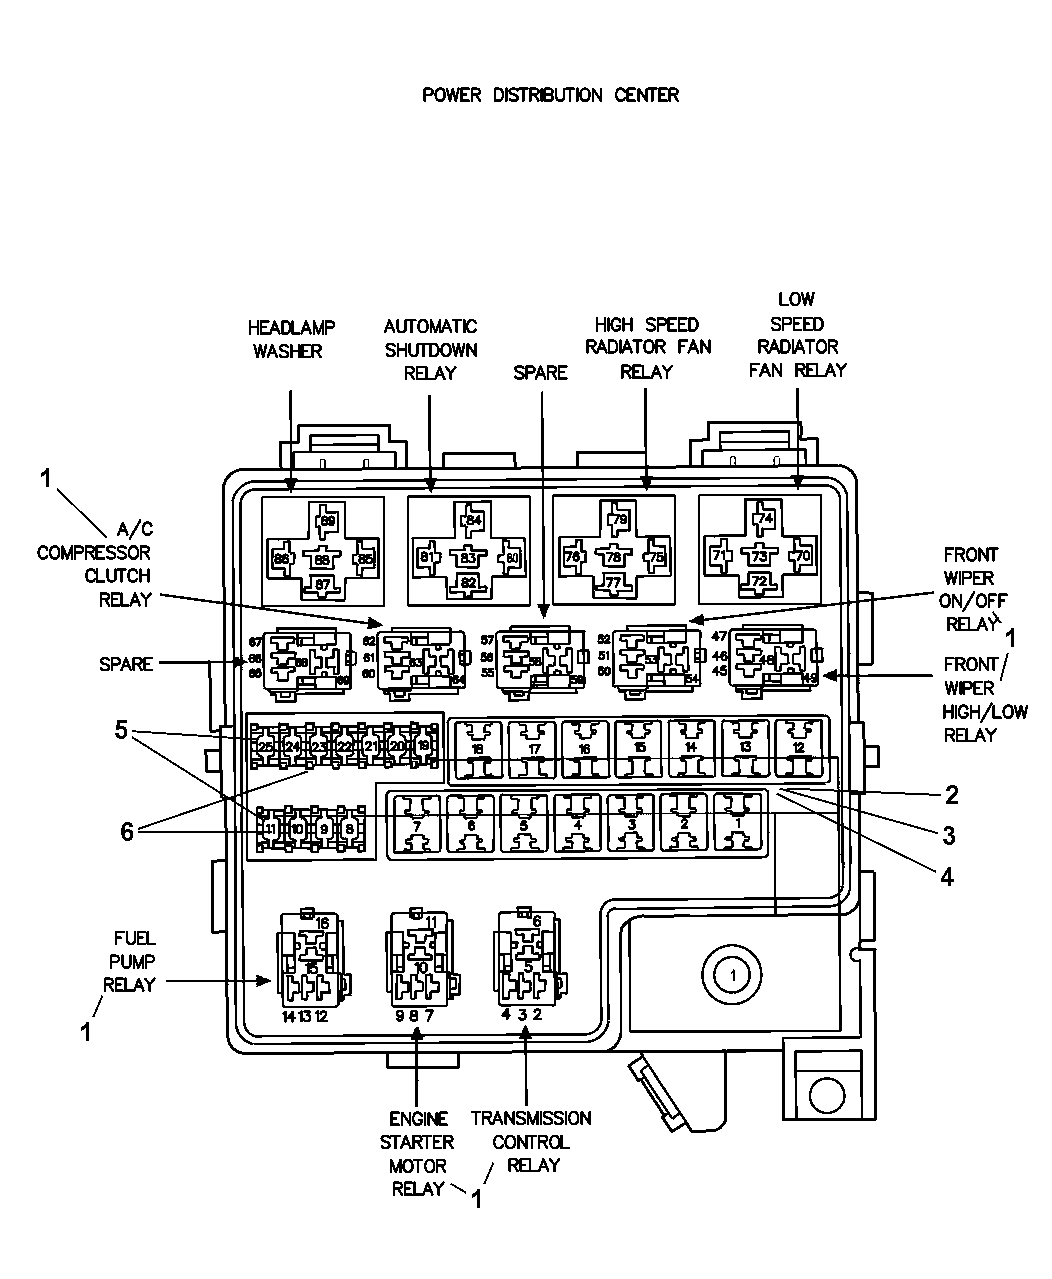 2006 dodge stratus power distribution center relays. Black Bedroom Furniture Sets. Home Design Ideas